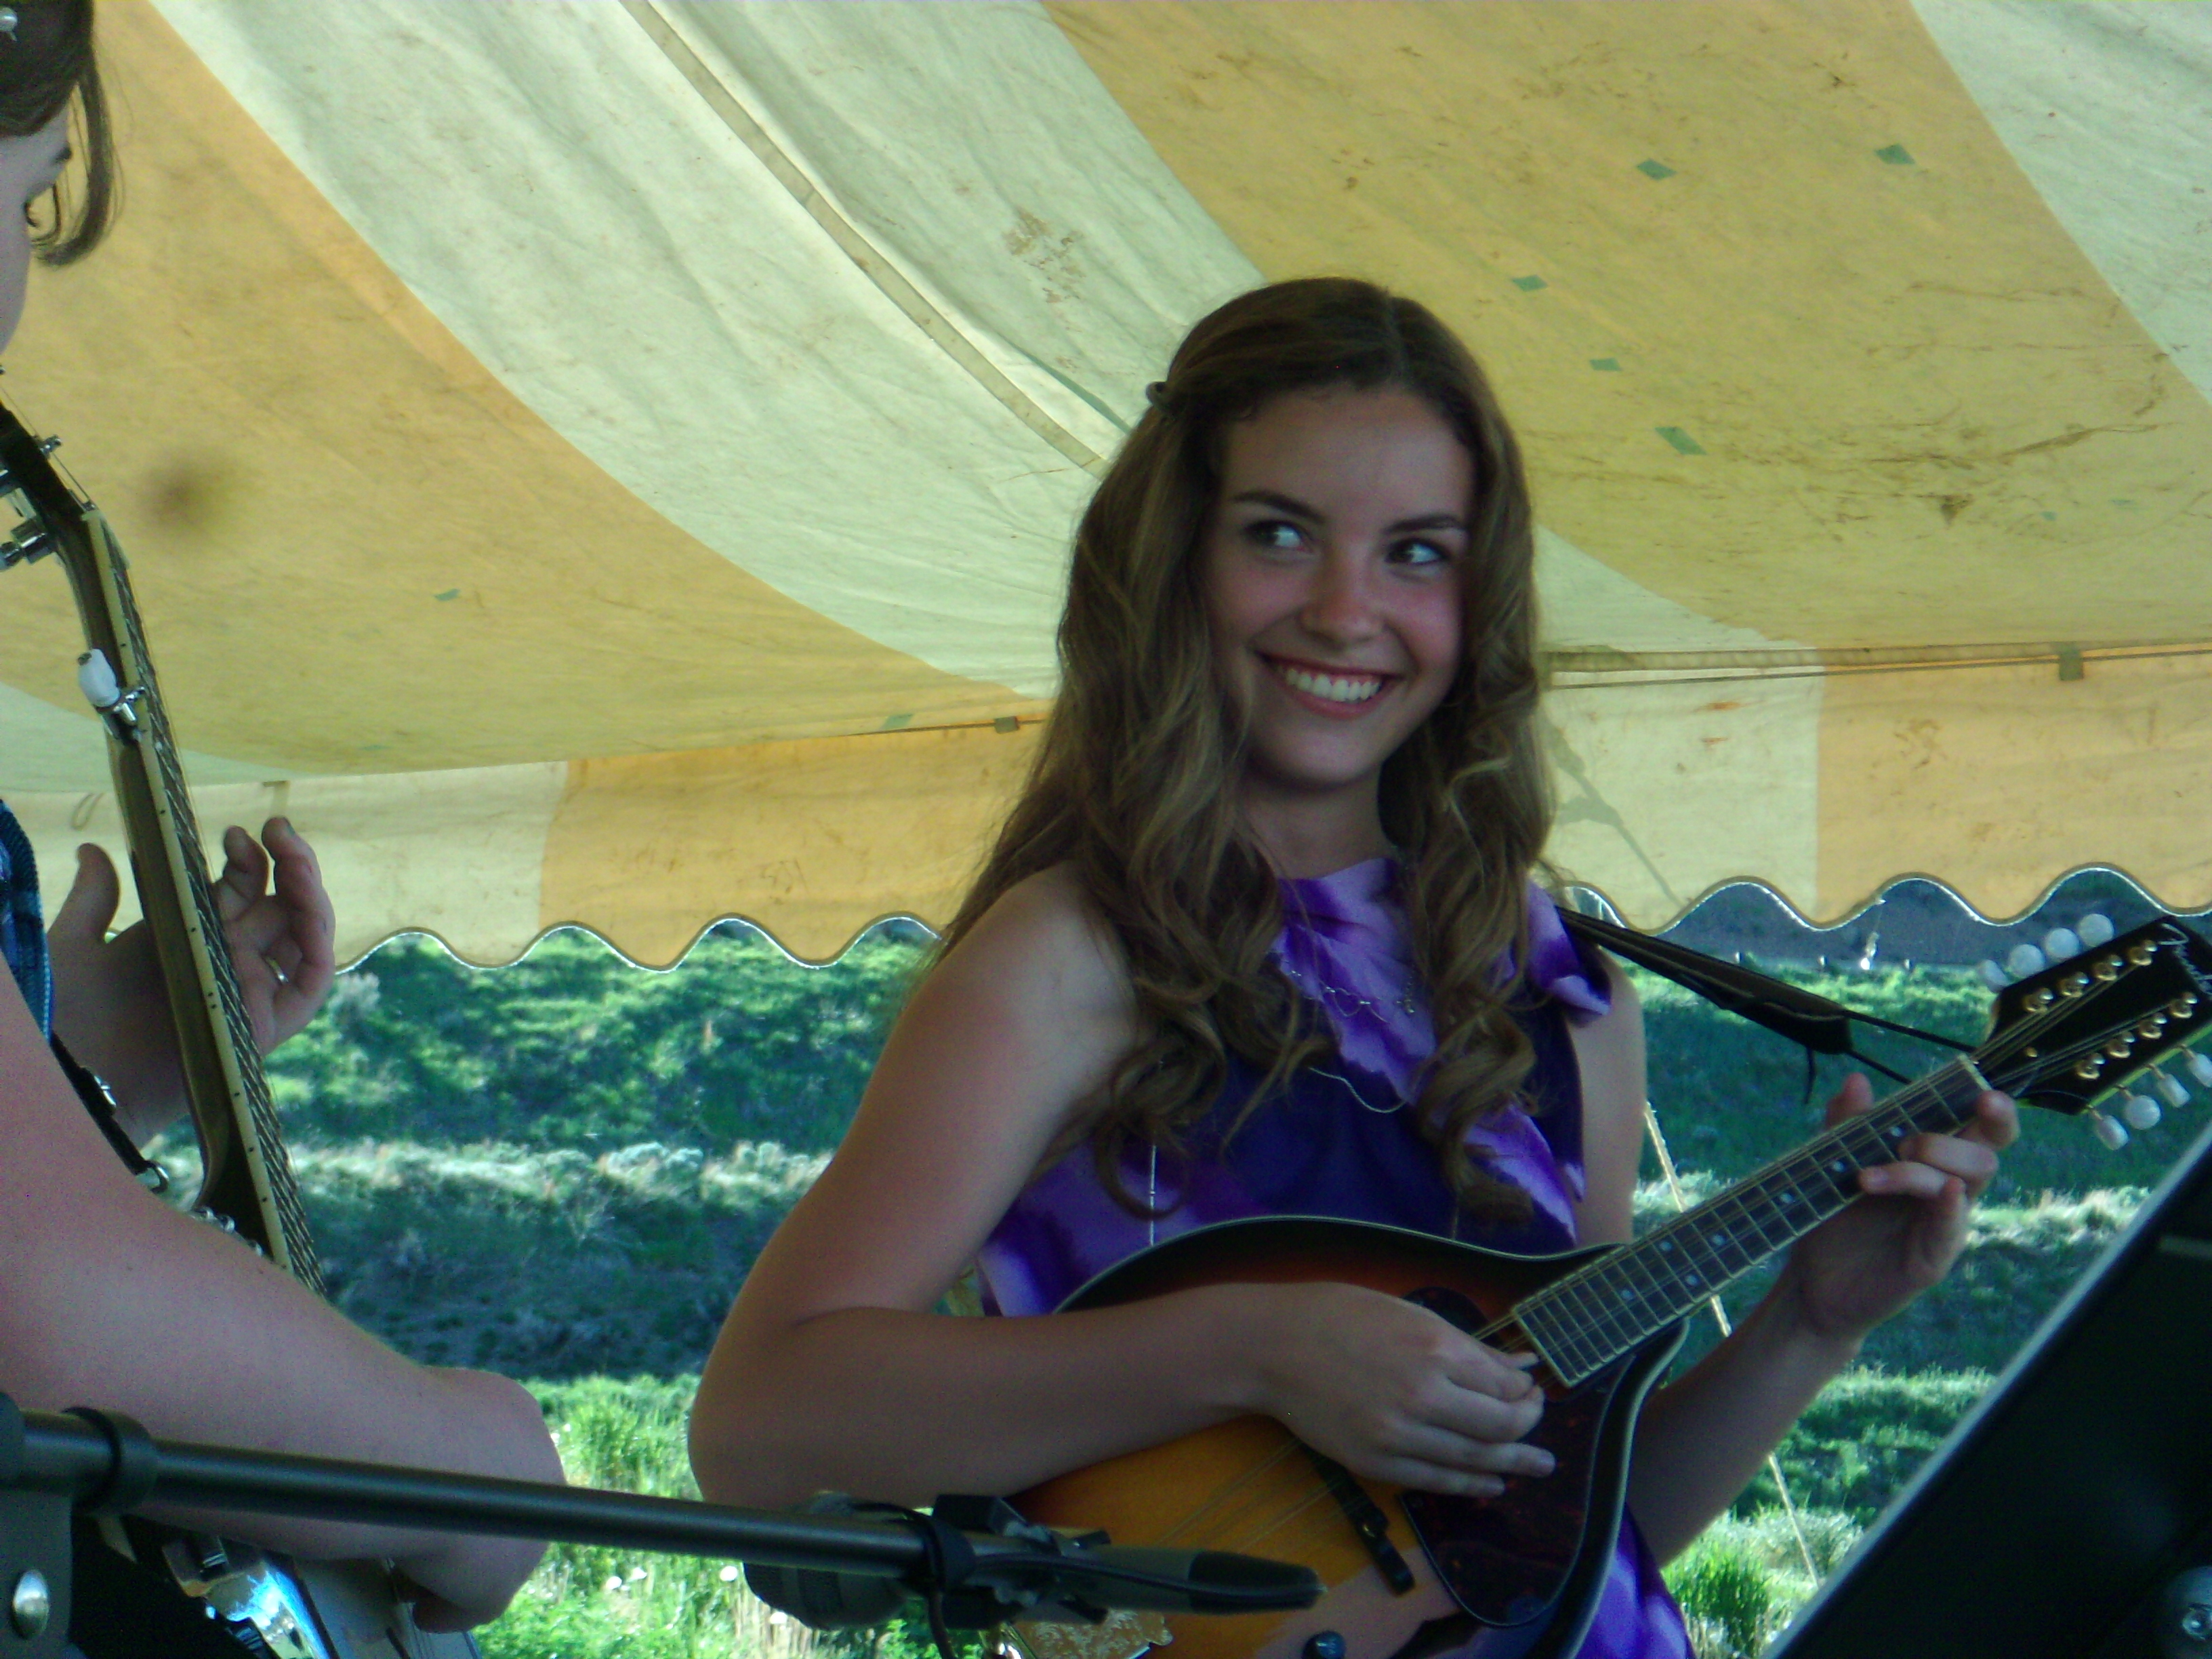 Guitar Concert 2010 with mandolin (2)